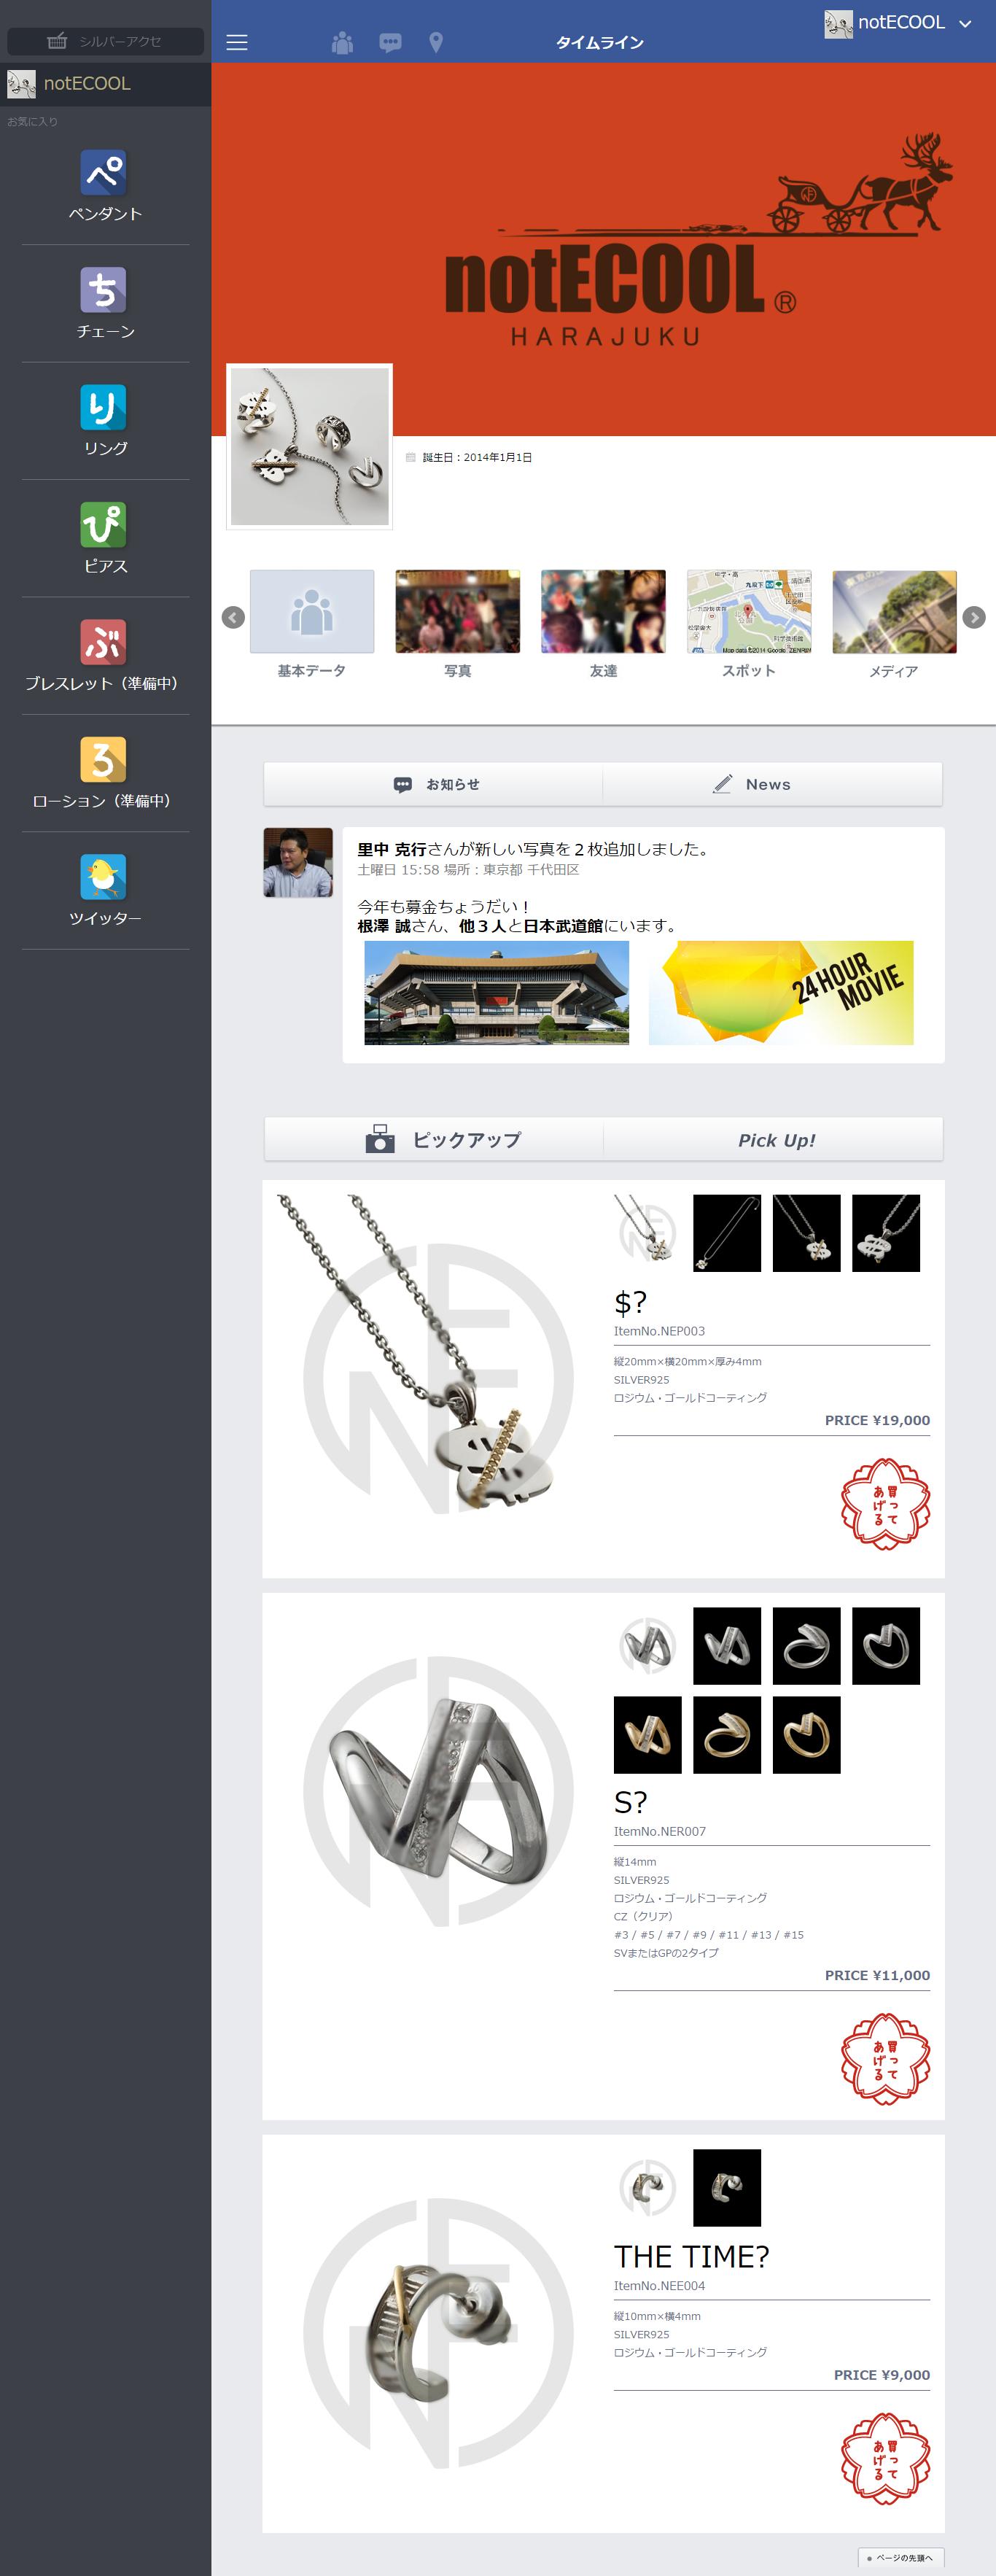 screencapture-file-I-NEC_2014_1020-not-ecool-tokyo-0827_-E9-A6-AC-E8-BB-8A-E4-BF-AE-E6-AD-A3_-E6-96-87-E5-AD-97-E4-BF-AE-E6-AD-A3-main-html-1456639263217